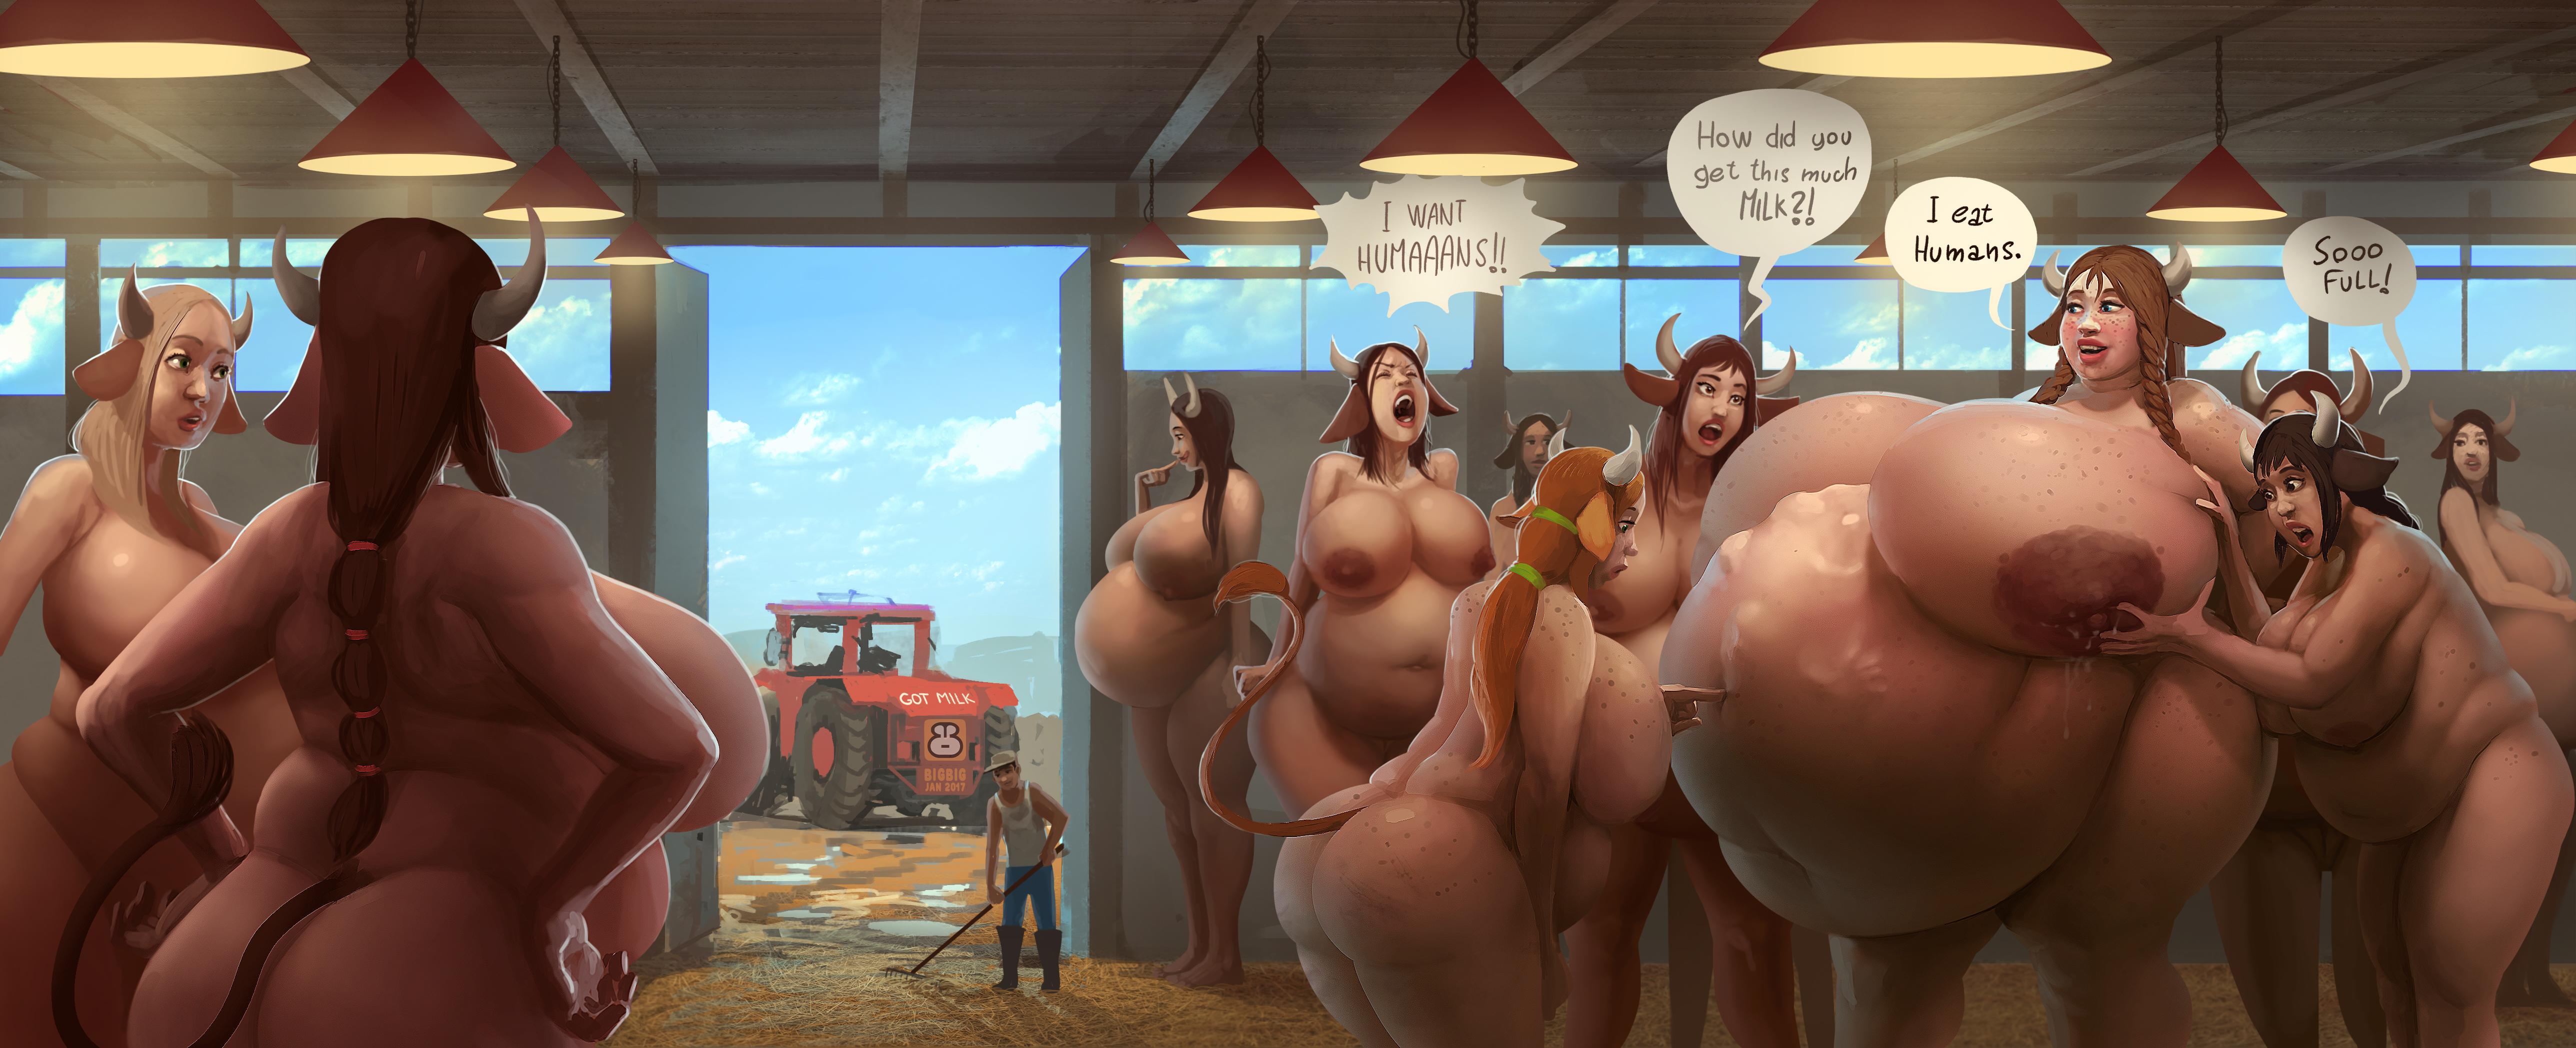 Big boobs ebony milking i want a cow like her dh 10